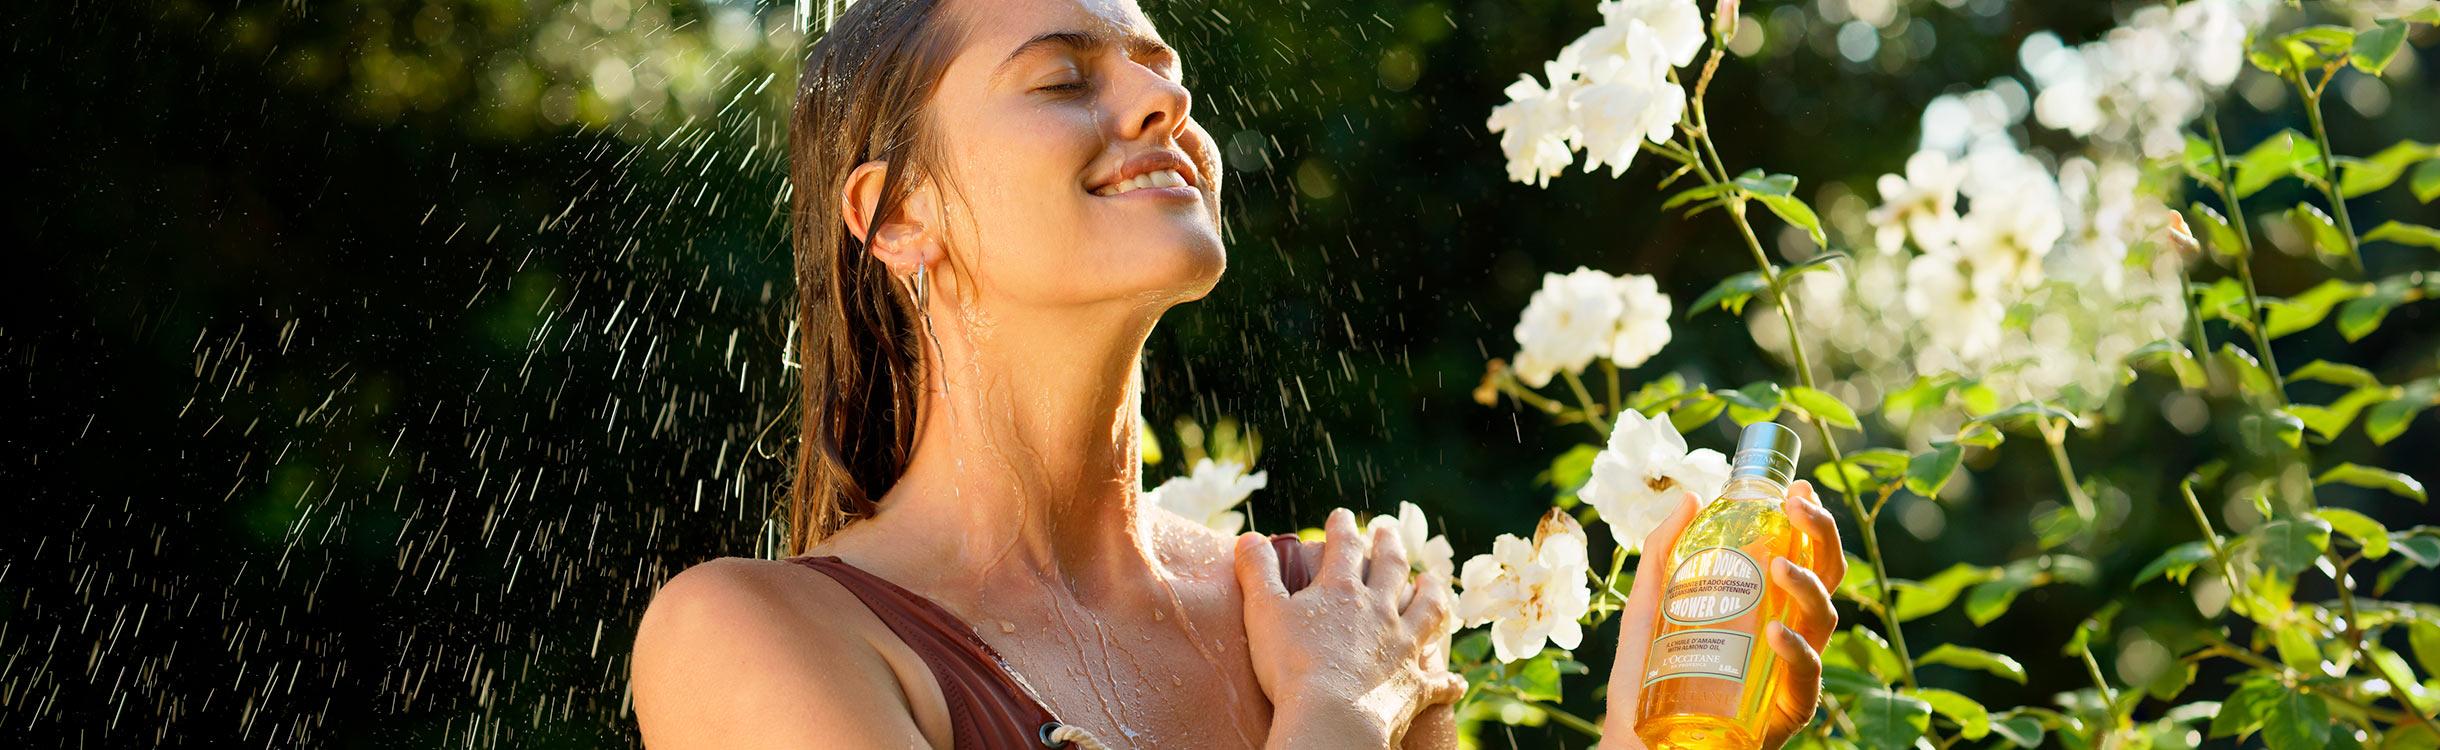 Cuidados para o Banho L'Occitane en Provence